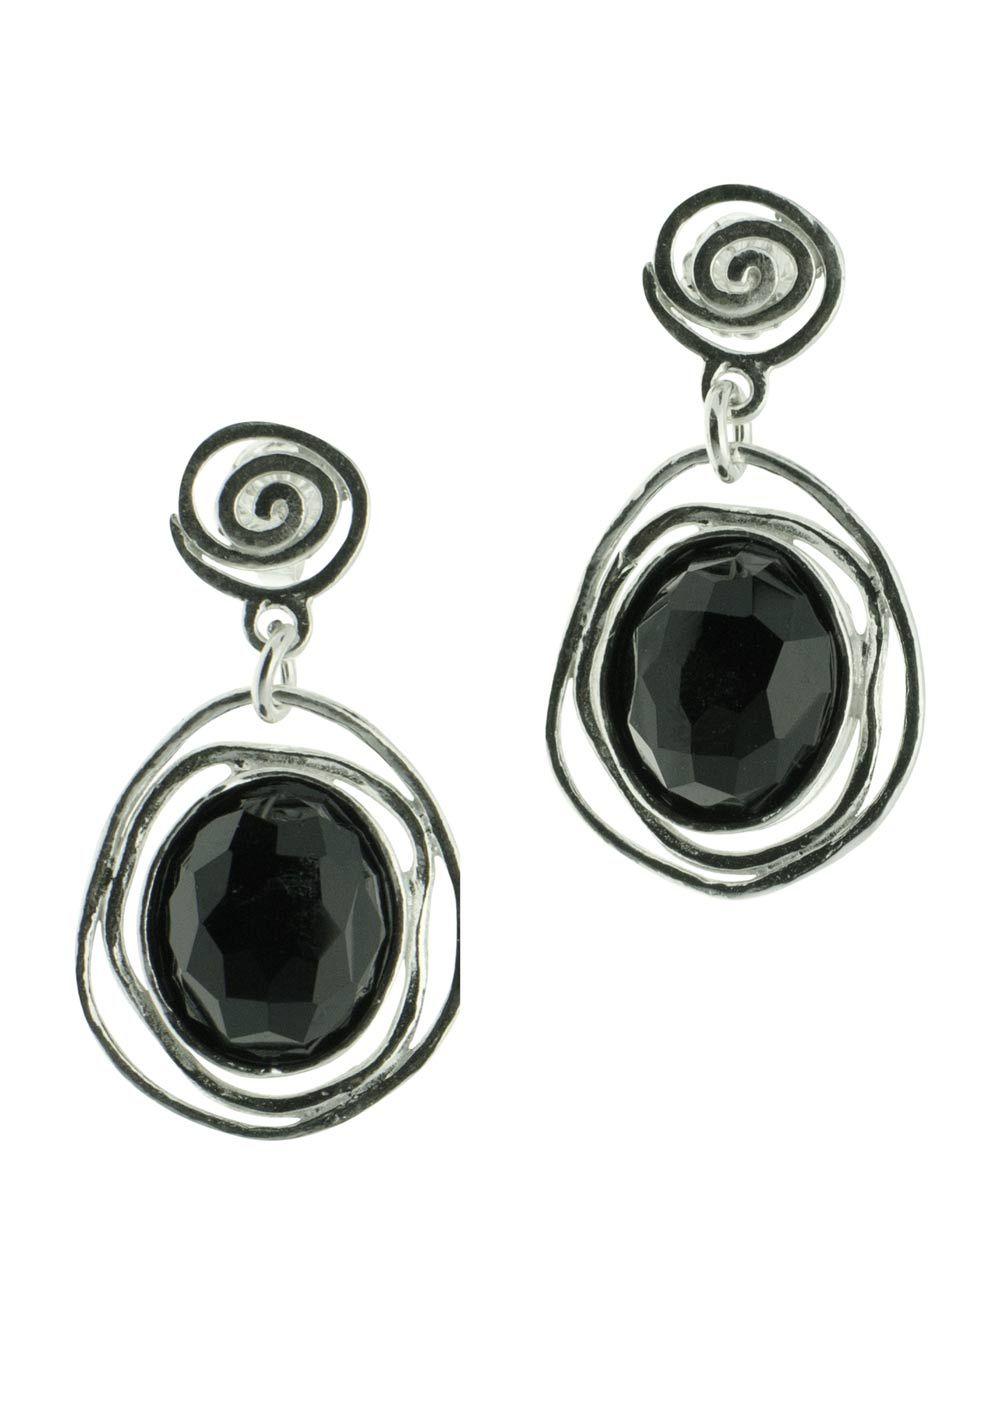 Onyx Post Dangly Silver Earrings  Organic Circle Black Onyx Earrings  Onyx Post Dangly  Minimalist Onyx  925 Sterling Silver